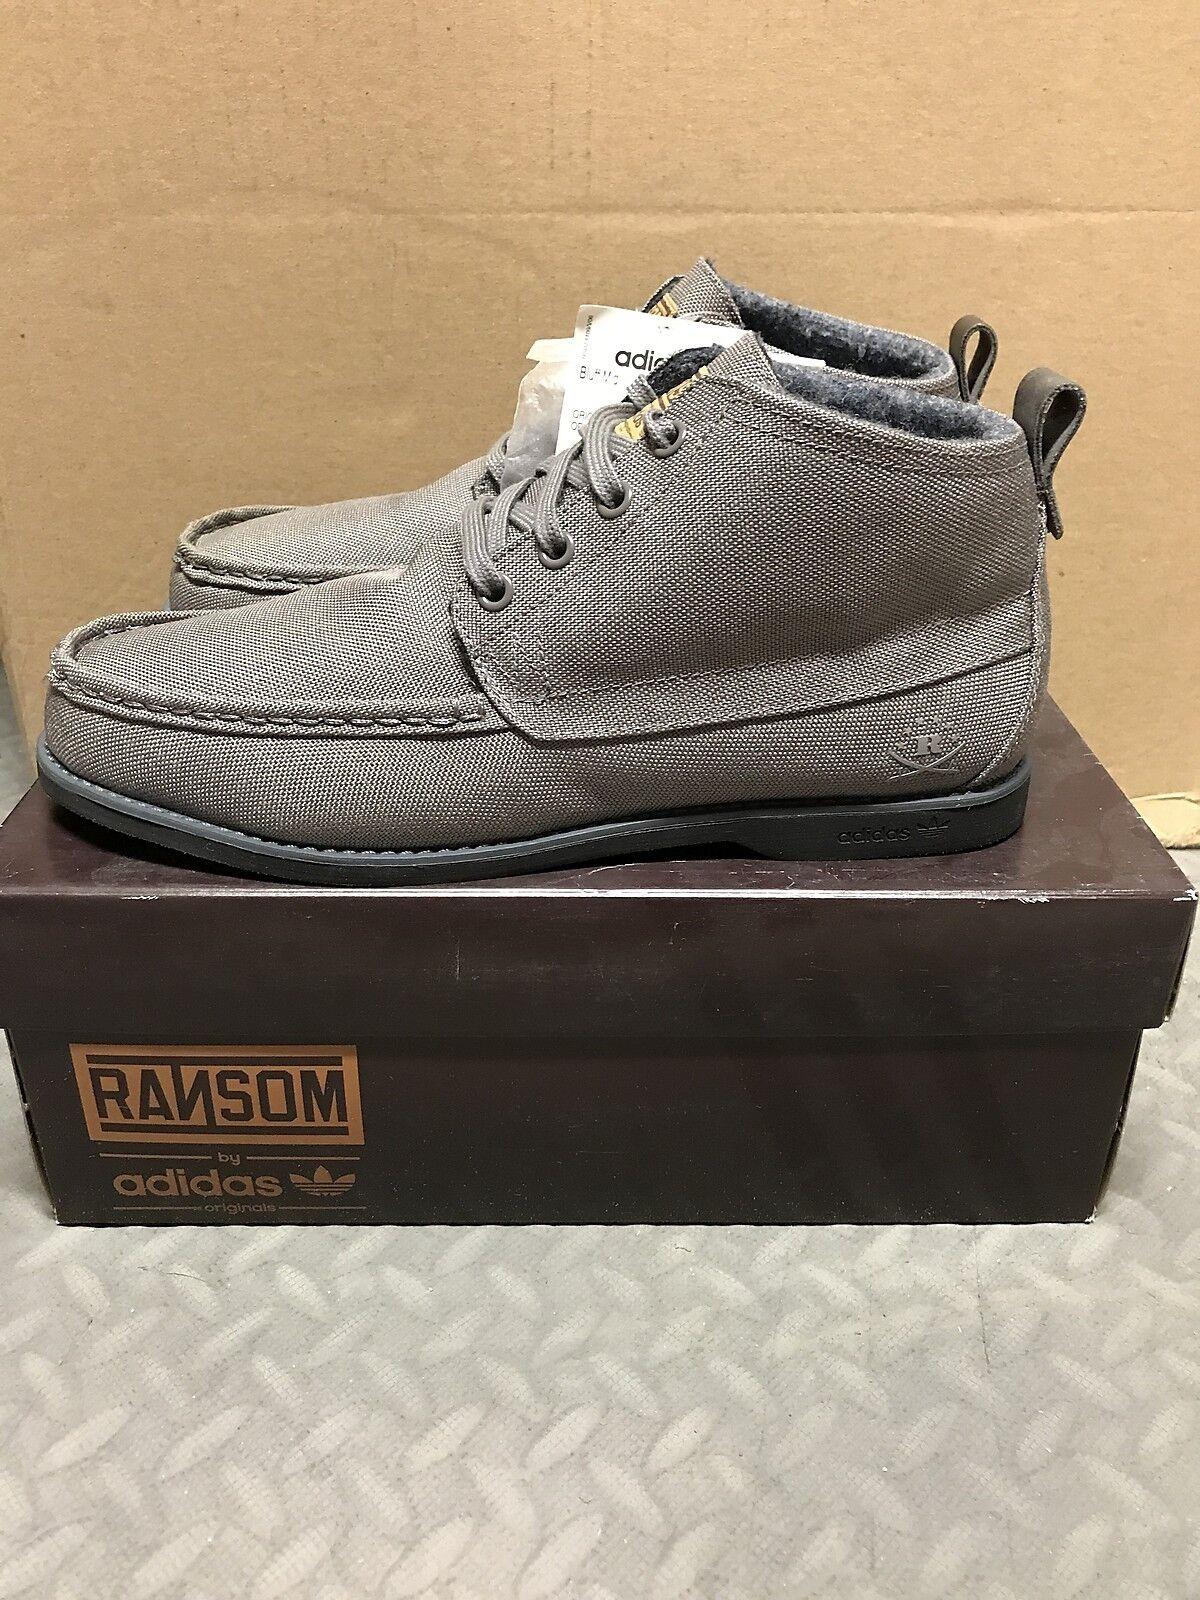 finest selection 9dddb 77462 Adidas Originals x Ransom Bluff Mid Sneakers Sneakers Sneakers Hombre  nuevos corredores de pizarra g50899 hierro